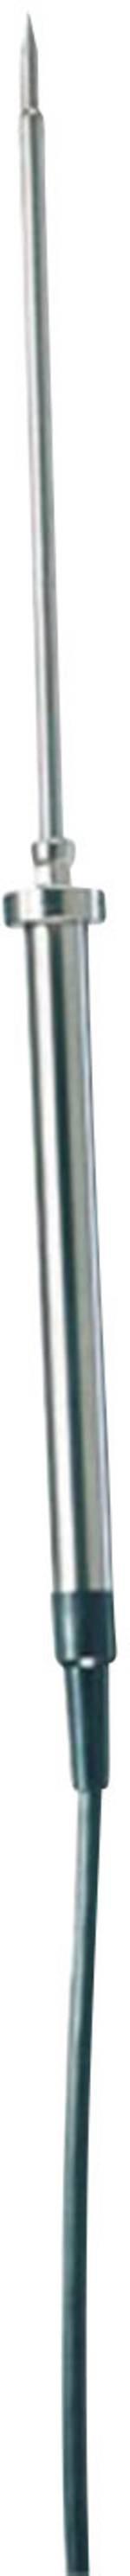 Sonde à piquer testo 0609 2272 -50 à 400 °C